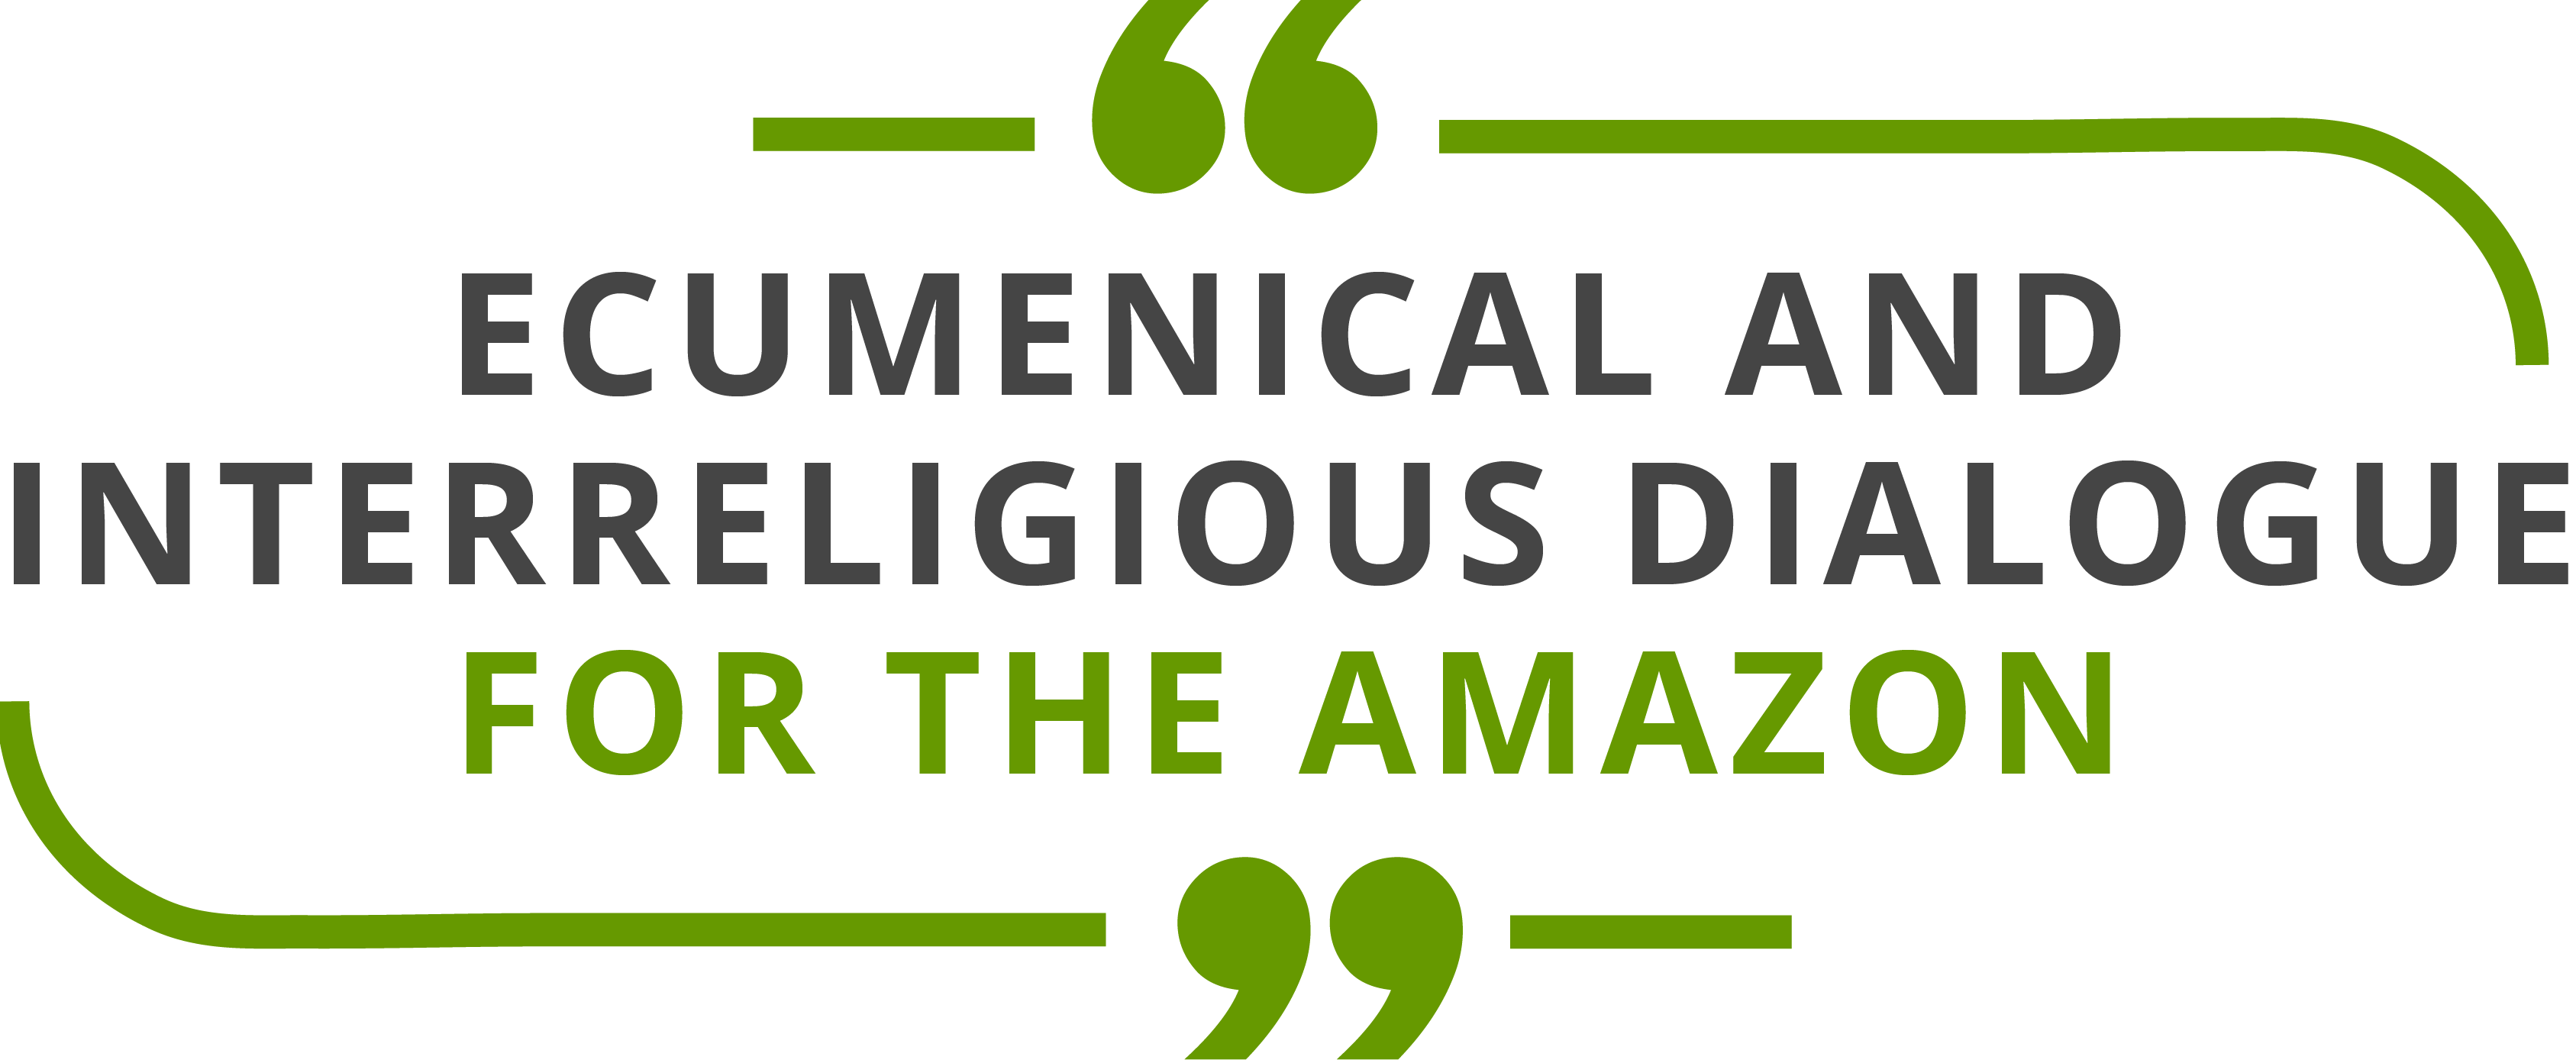 Ecumenical and interreligious dialogue for the Amazon